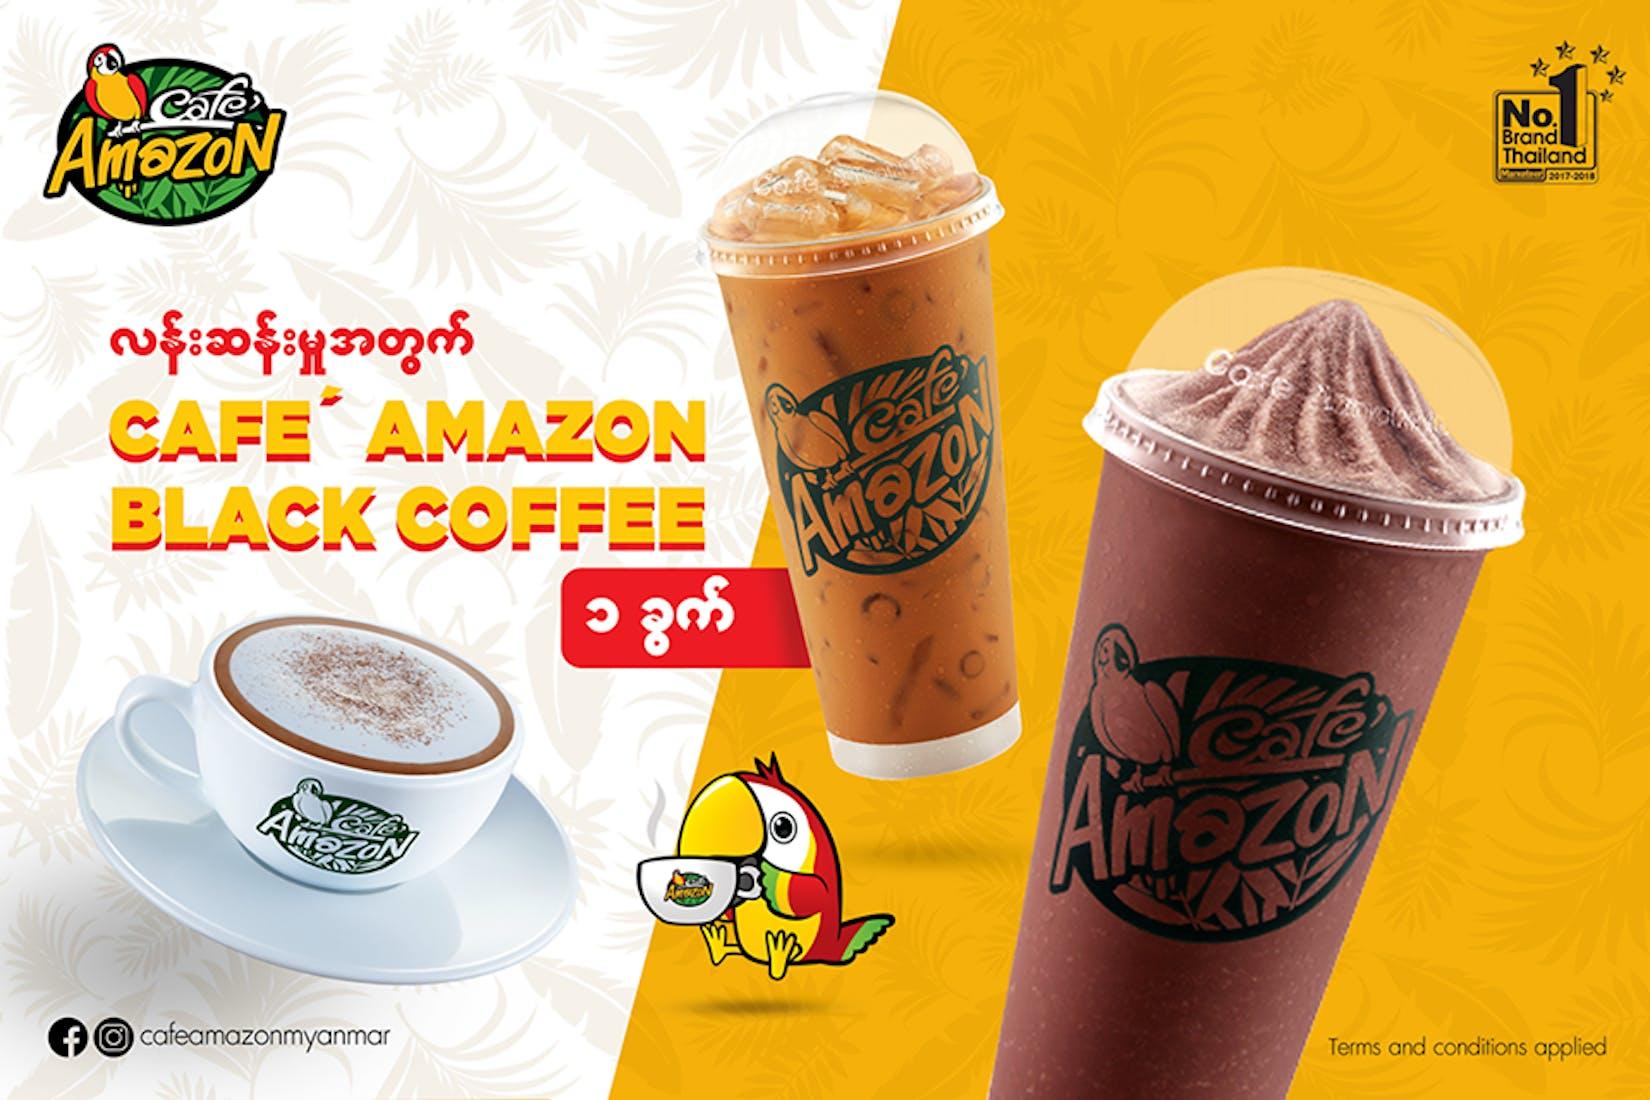 Café Amazon Junction City | yathar